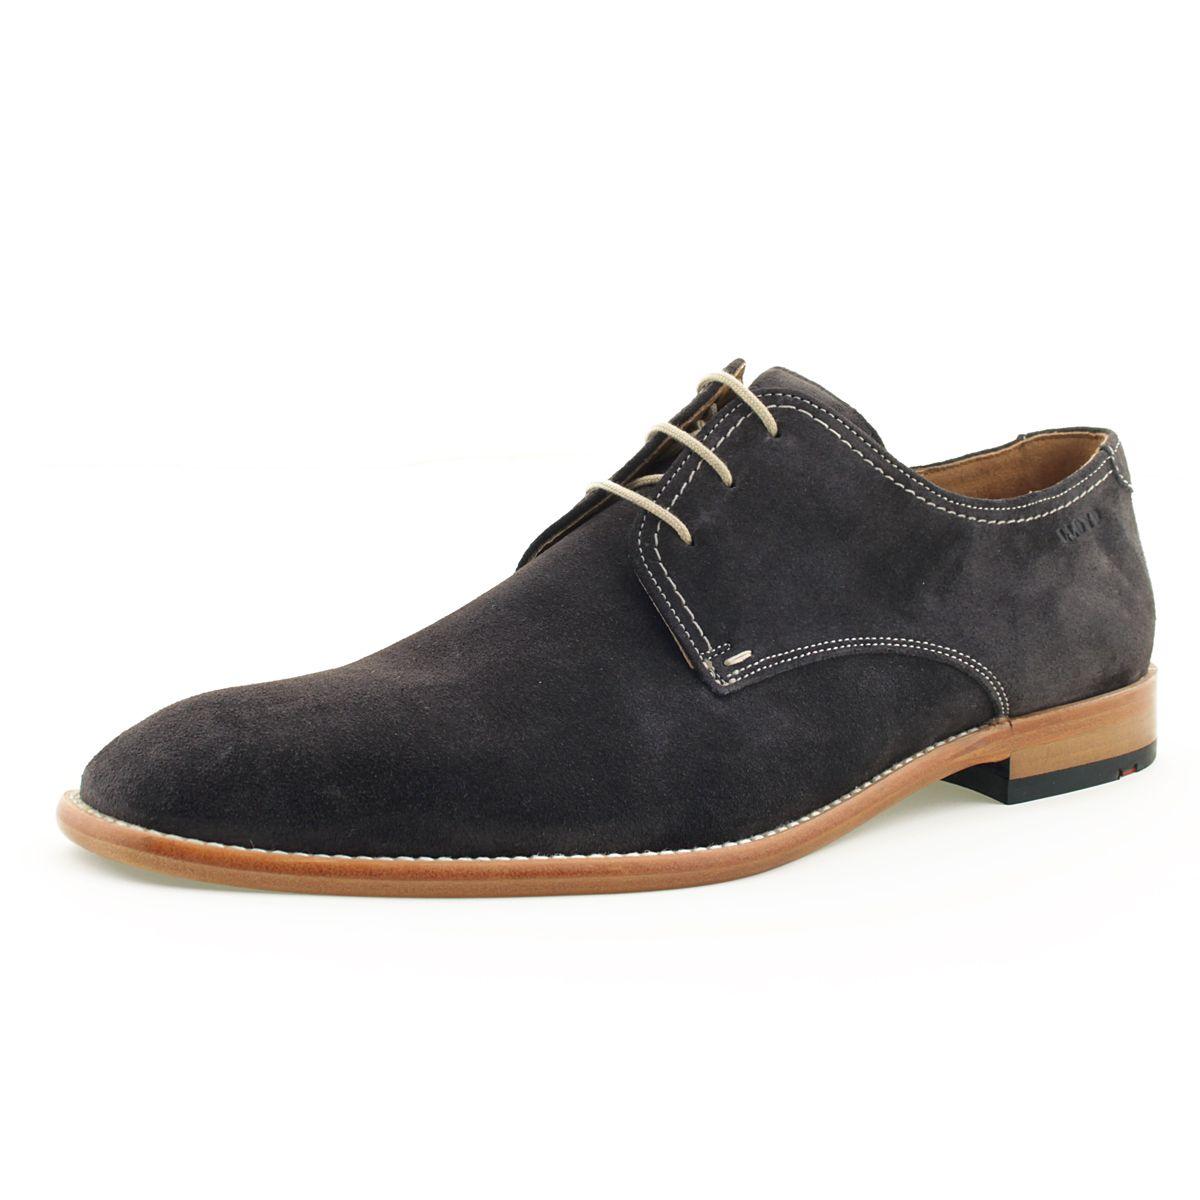 chaussure grande taille homme. Black Bedroom Furniture Sets. Home Design Ideas